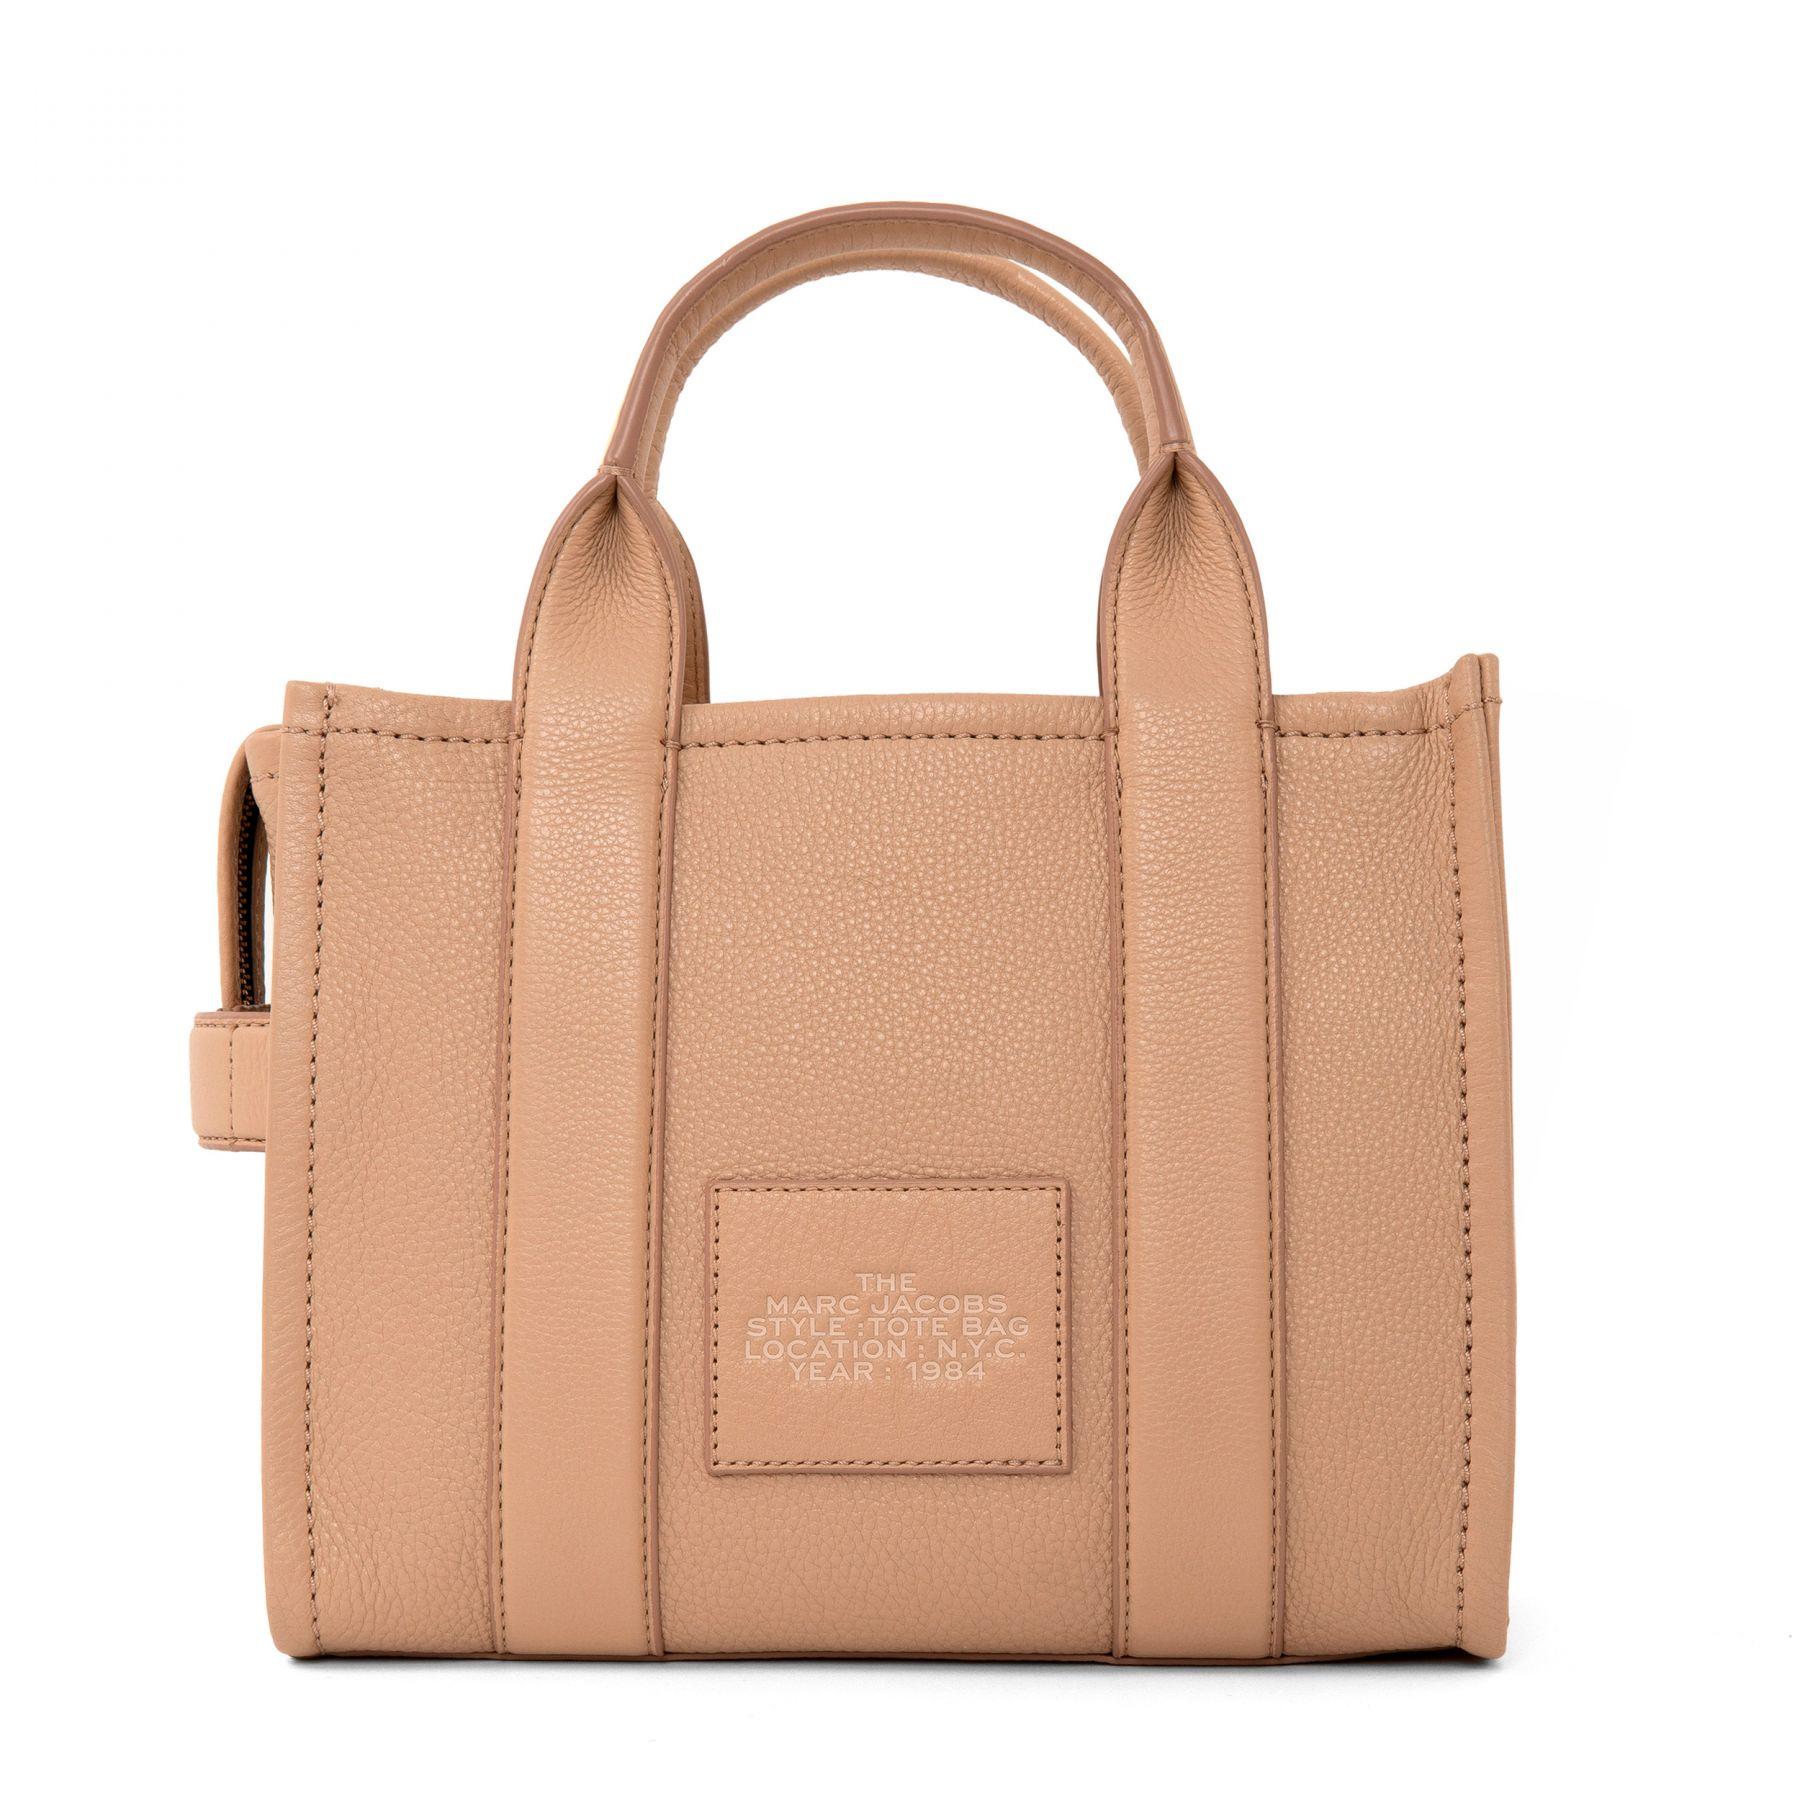 Сумка Marc Jacobs The Mini Tote Bag бежевая